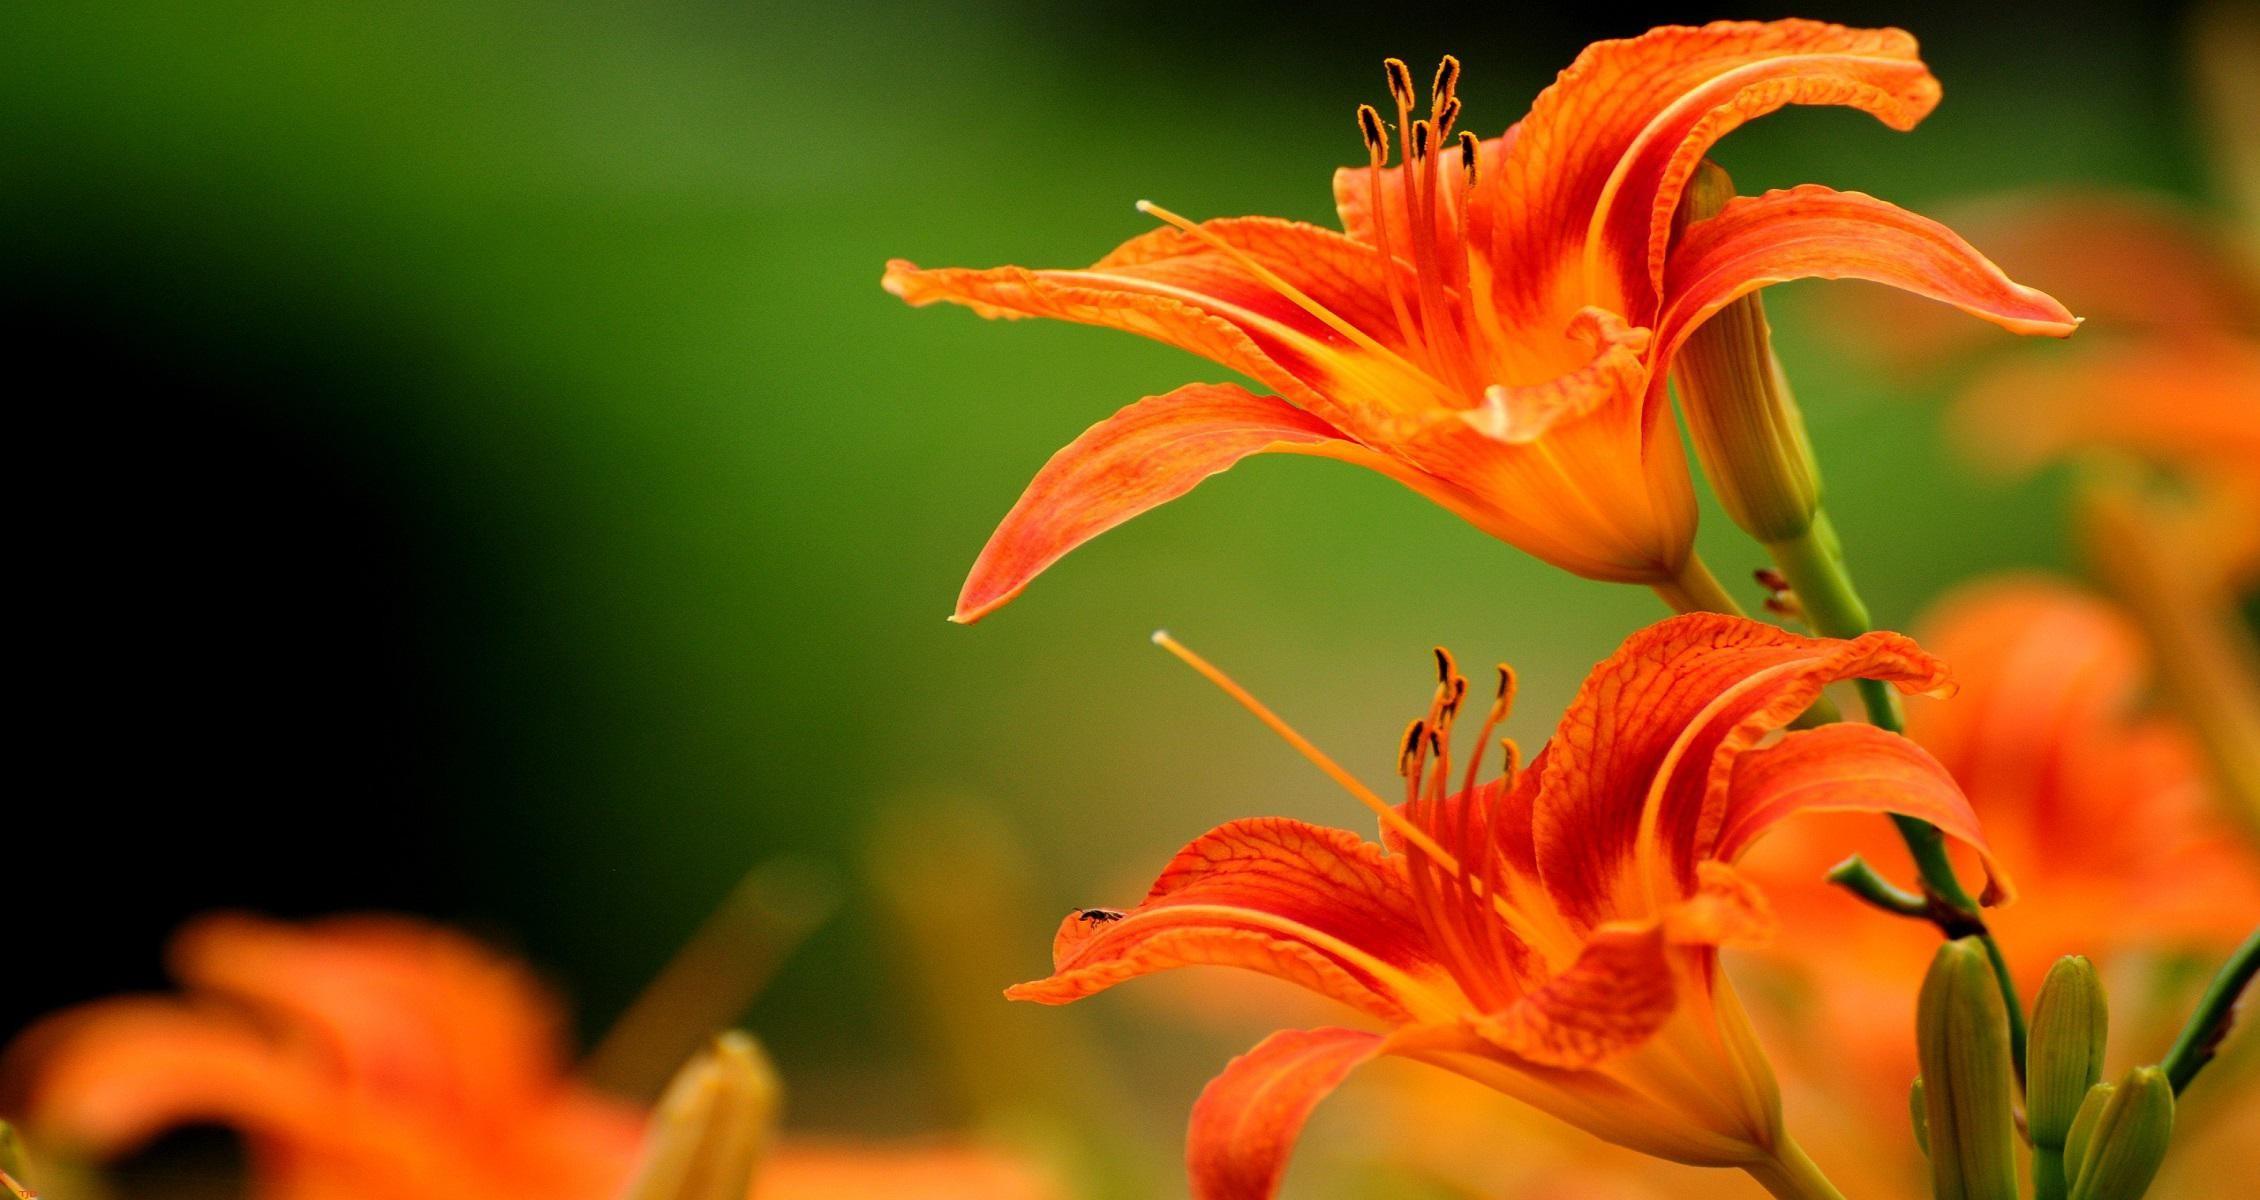 Tiger lily wallpaper download x 1536 izmirmasajfo